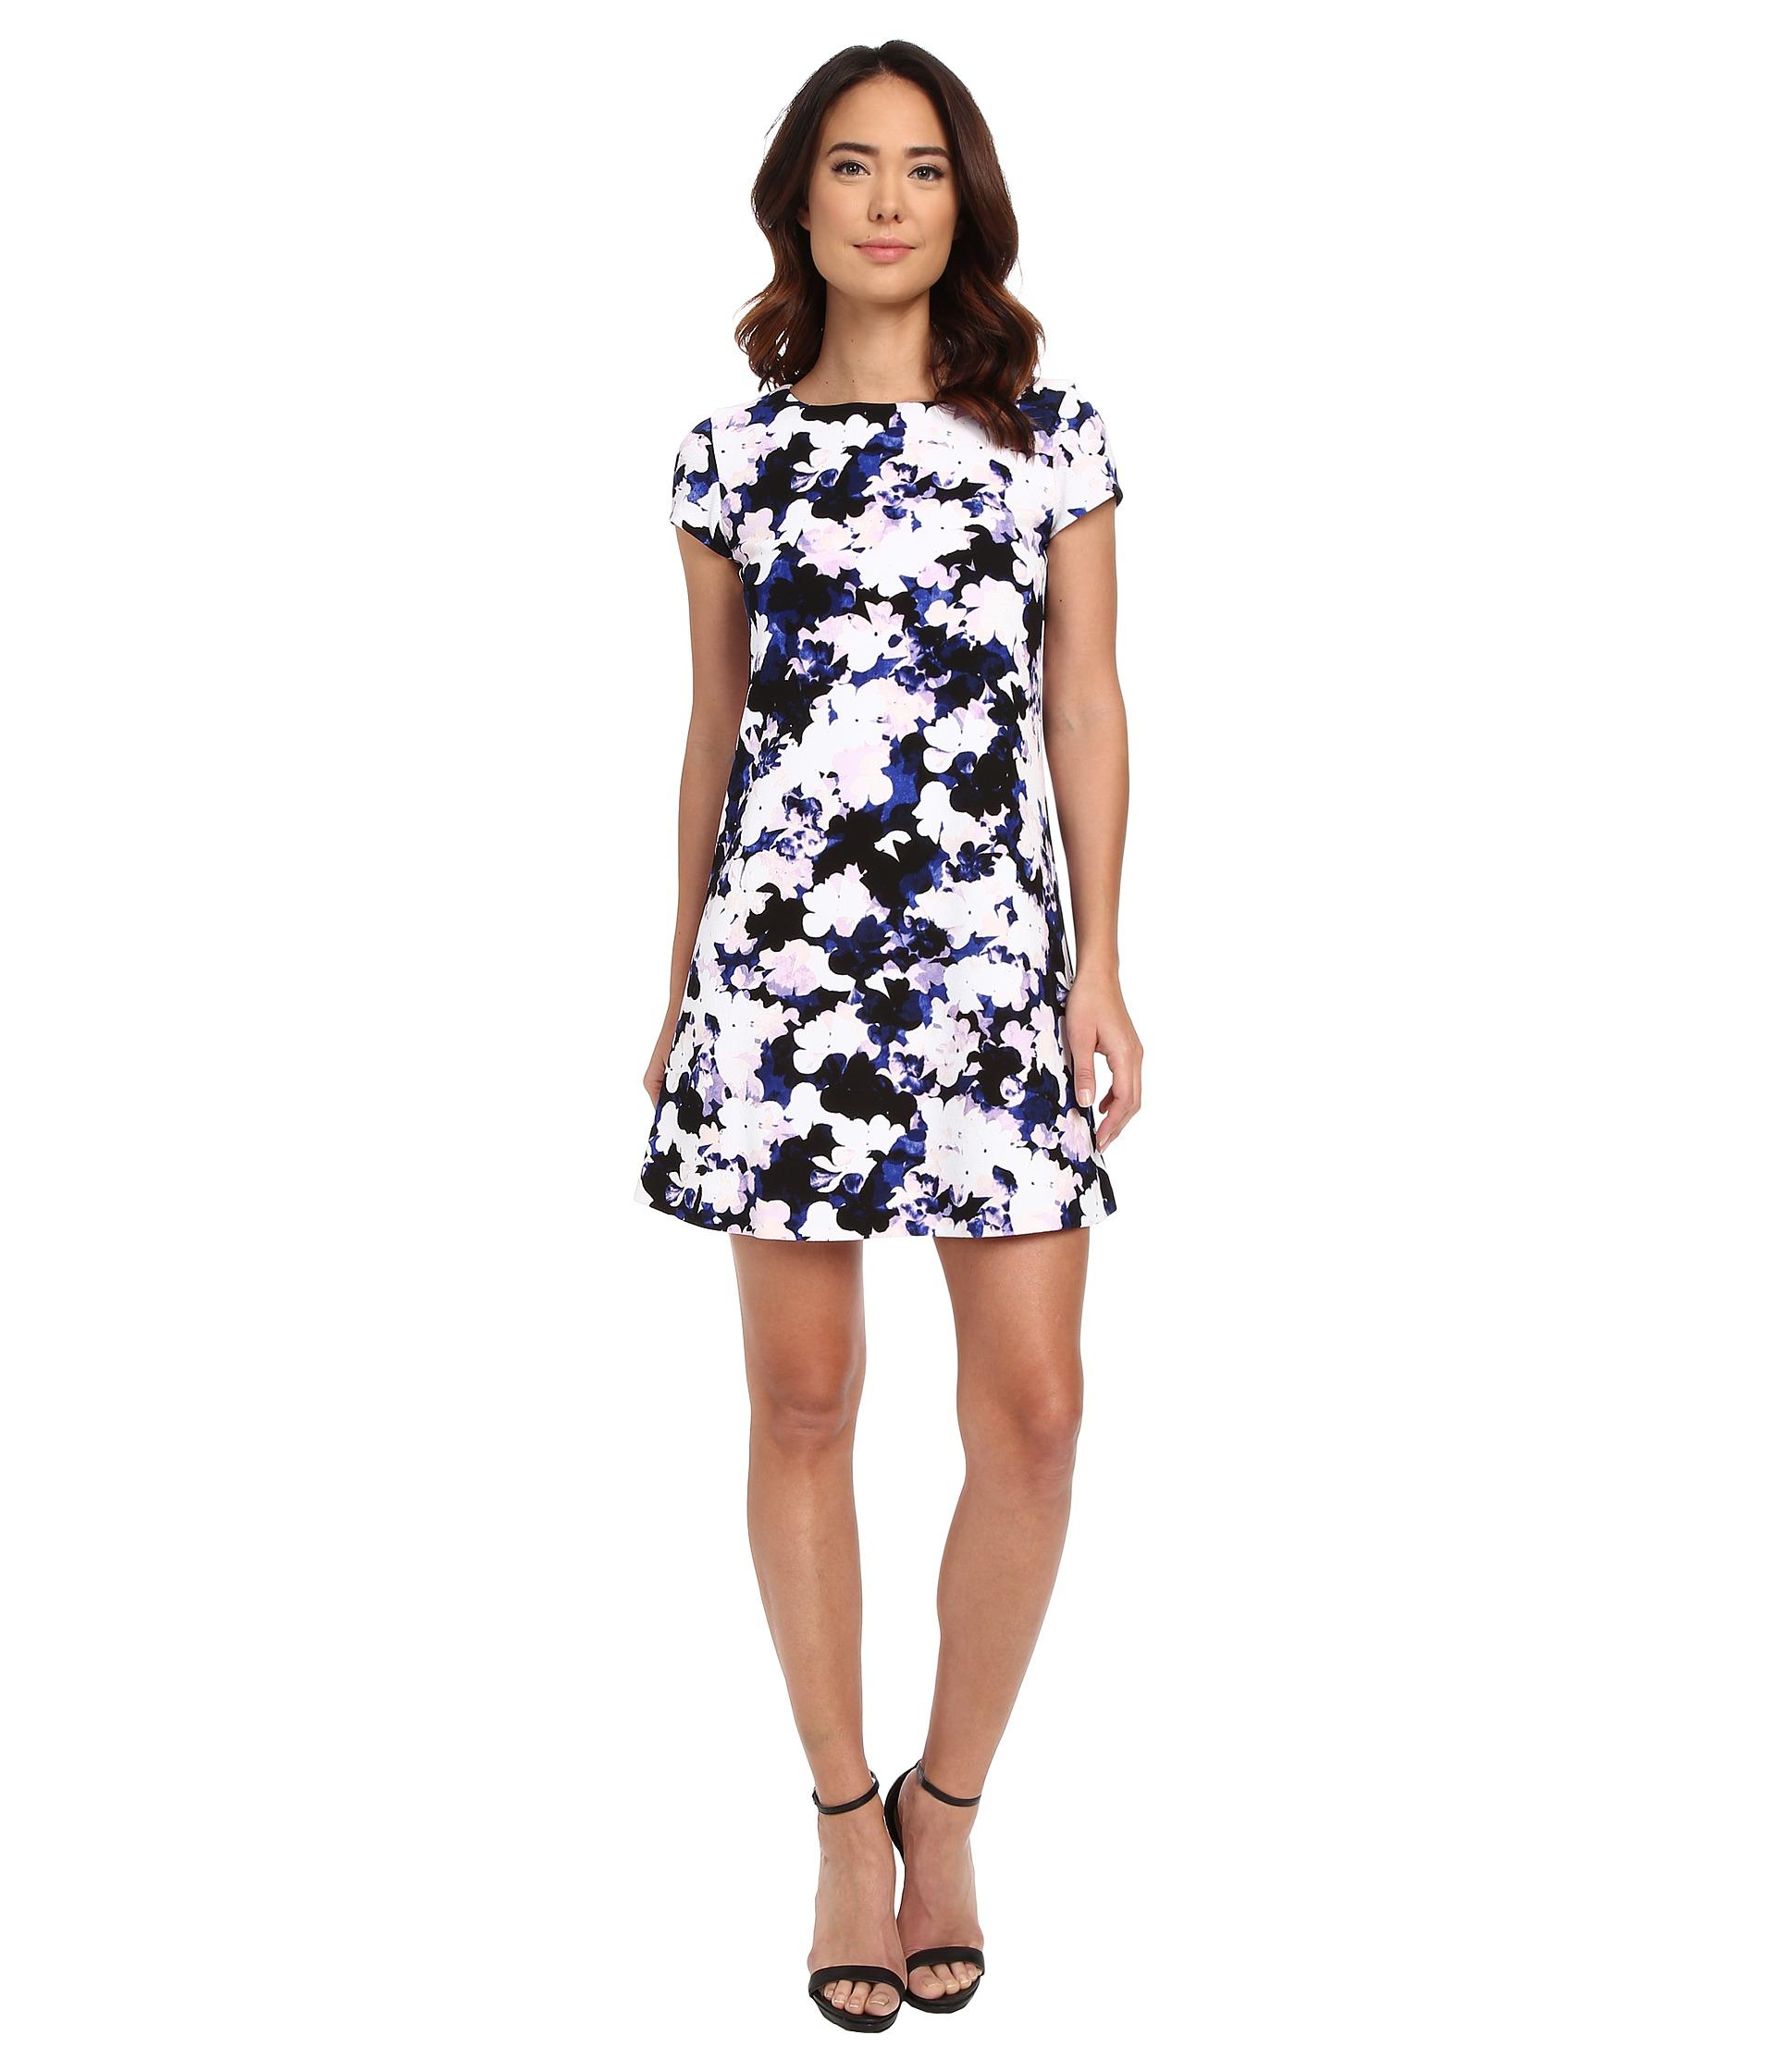 52c530597d748f Lyst - Jessica Simpson Short Sleeve Floral Print Shift Dress in Black